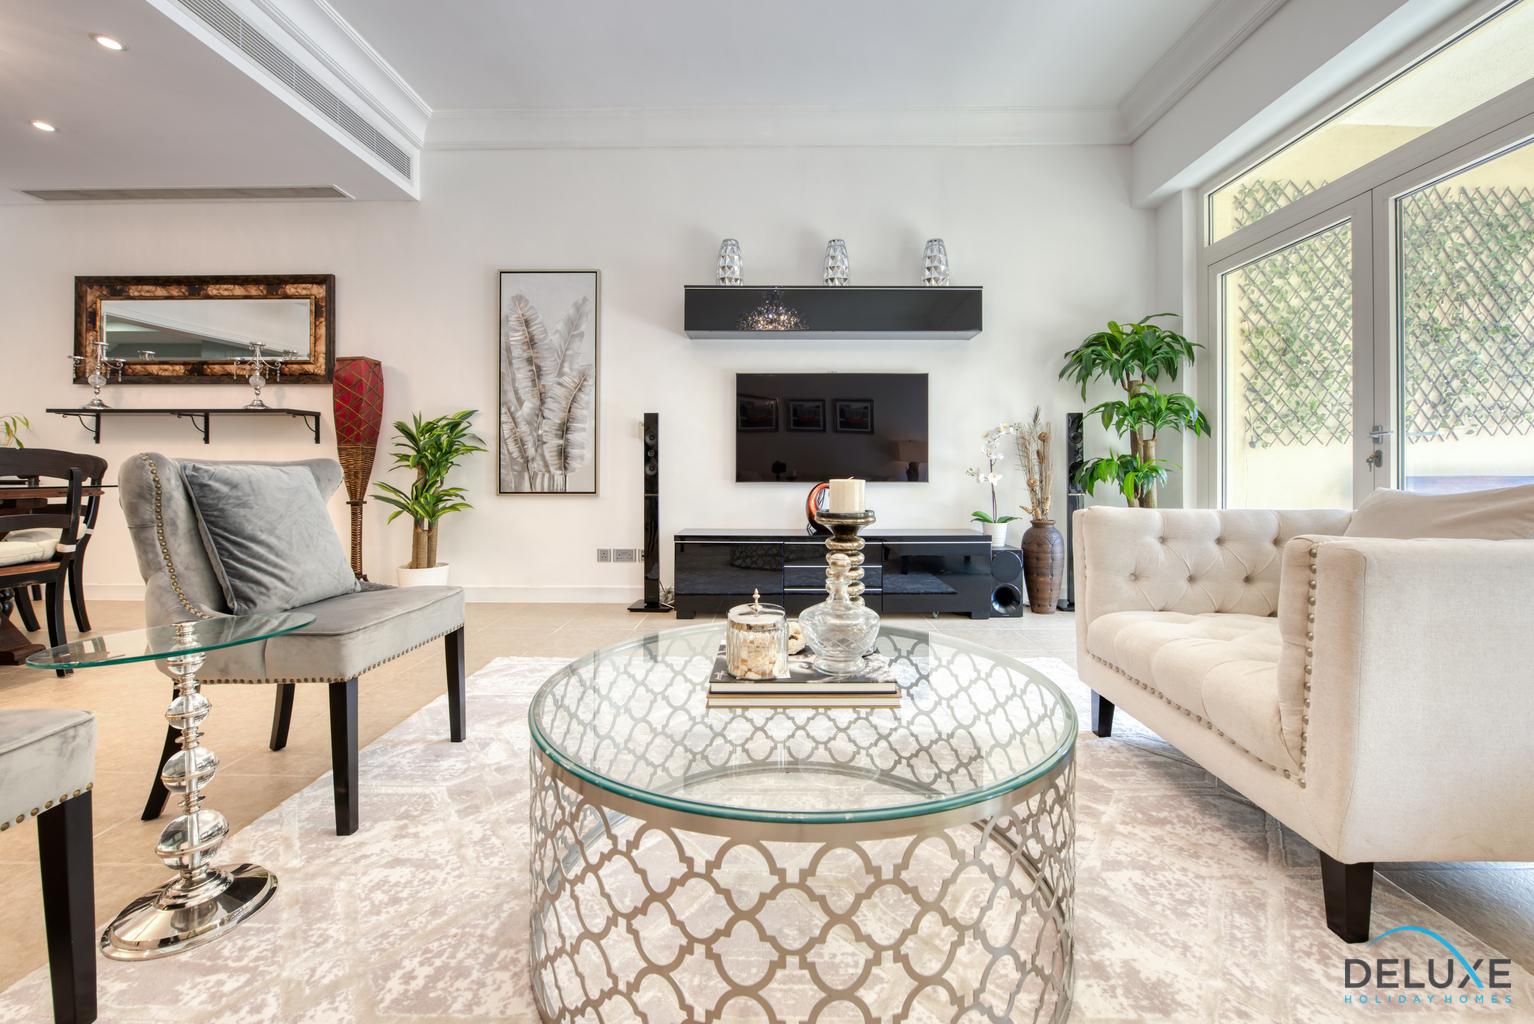 Lavish 2 Bedrooms in the Shoreline Apartments - Deluxe ...